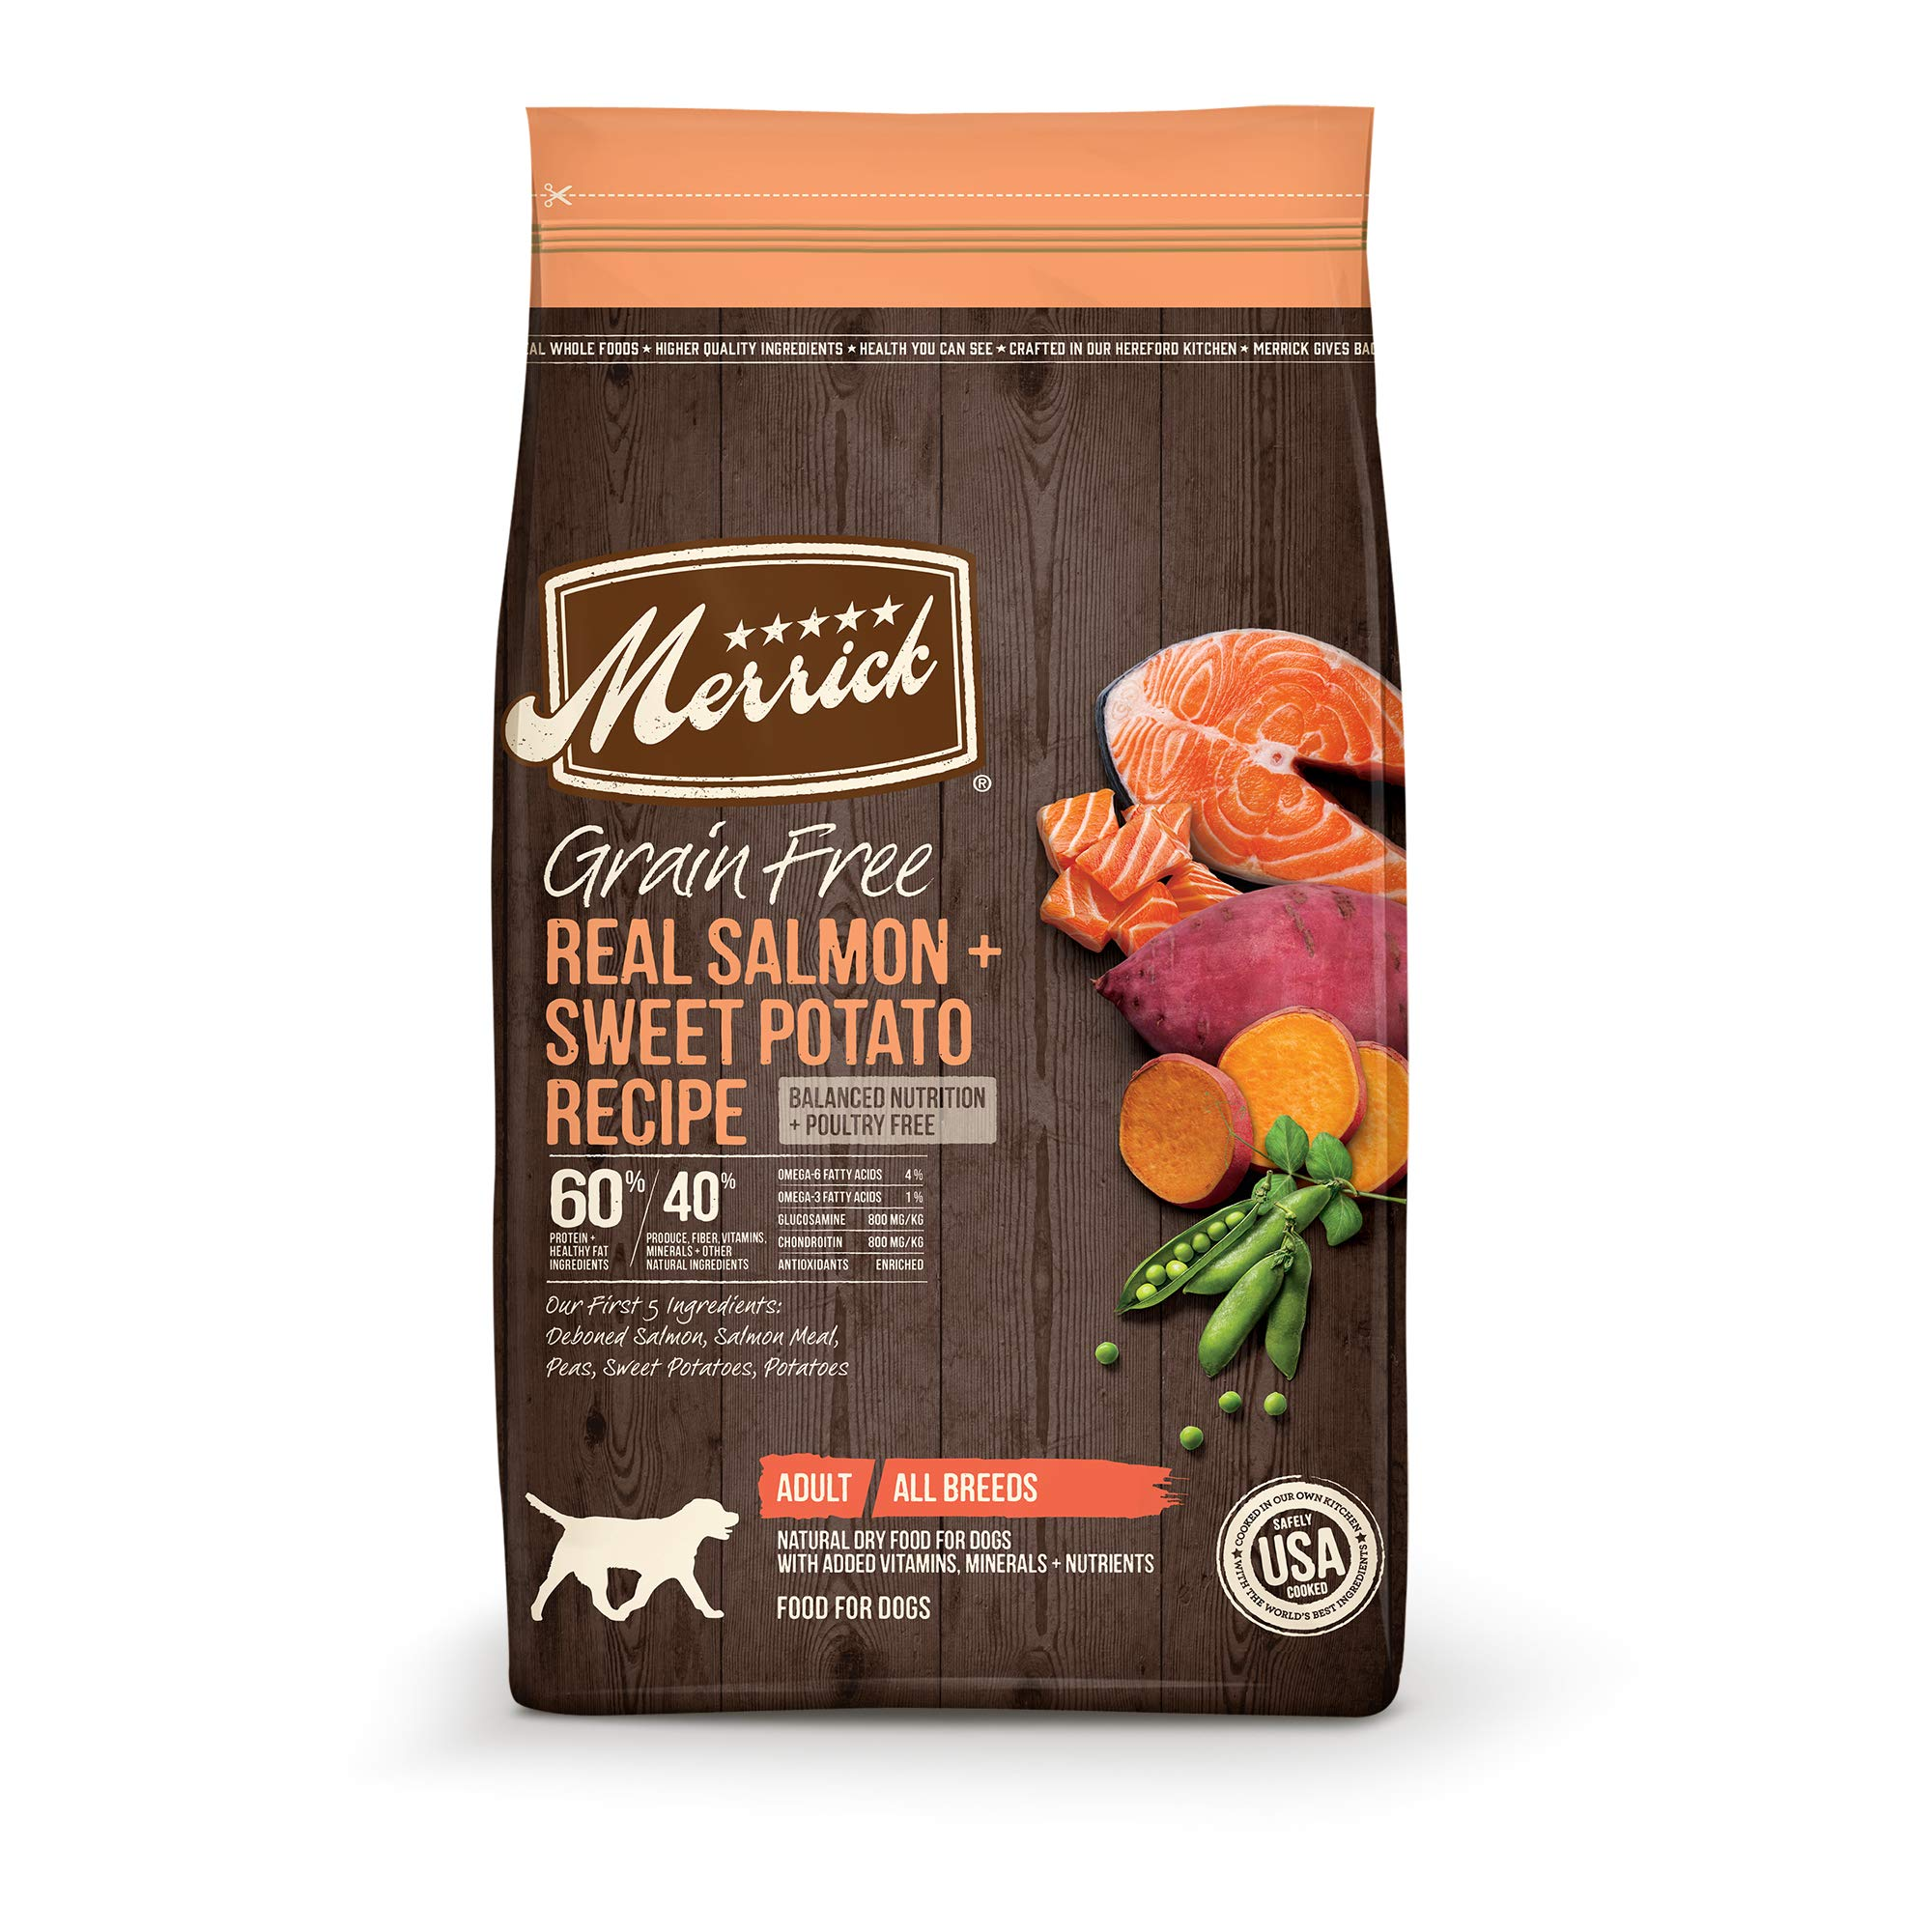 Merrick GF Salmon + Sweet Potato Recipe Dry Dog Food, 22 lb by Merrick